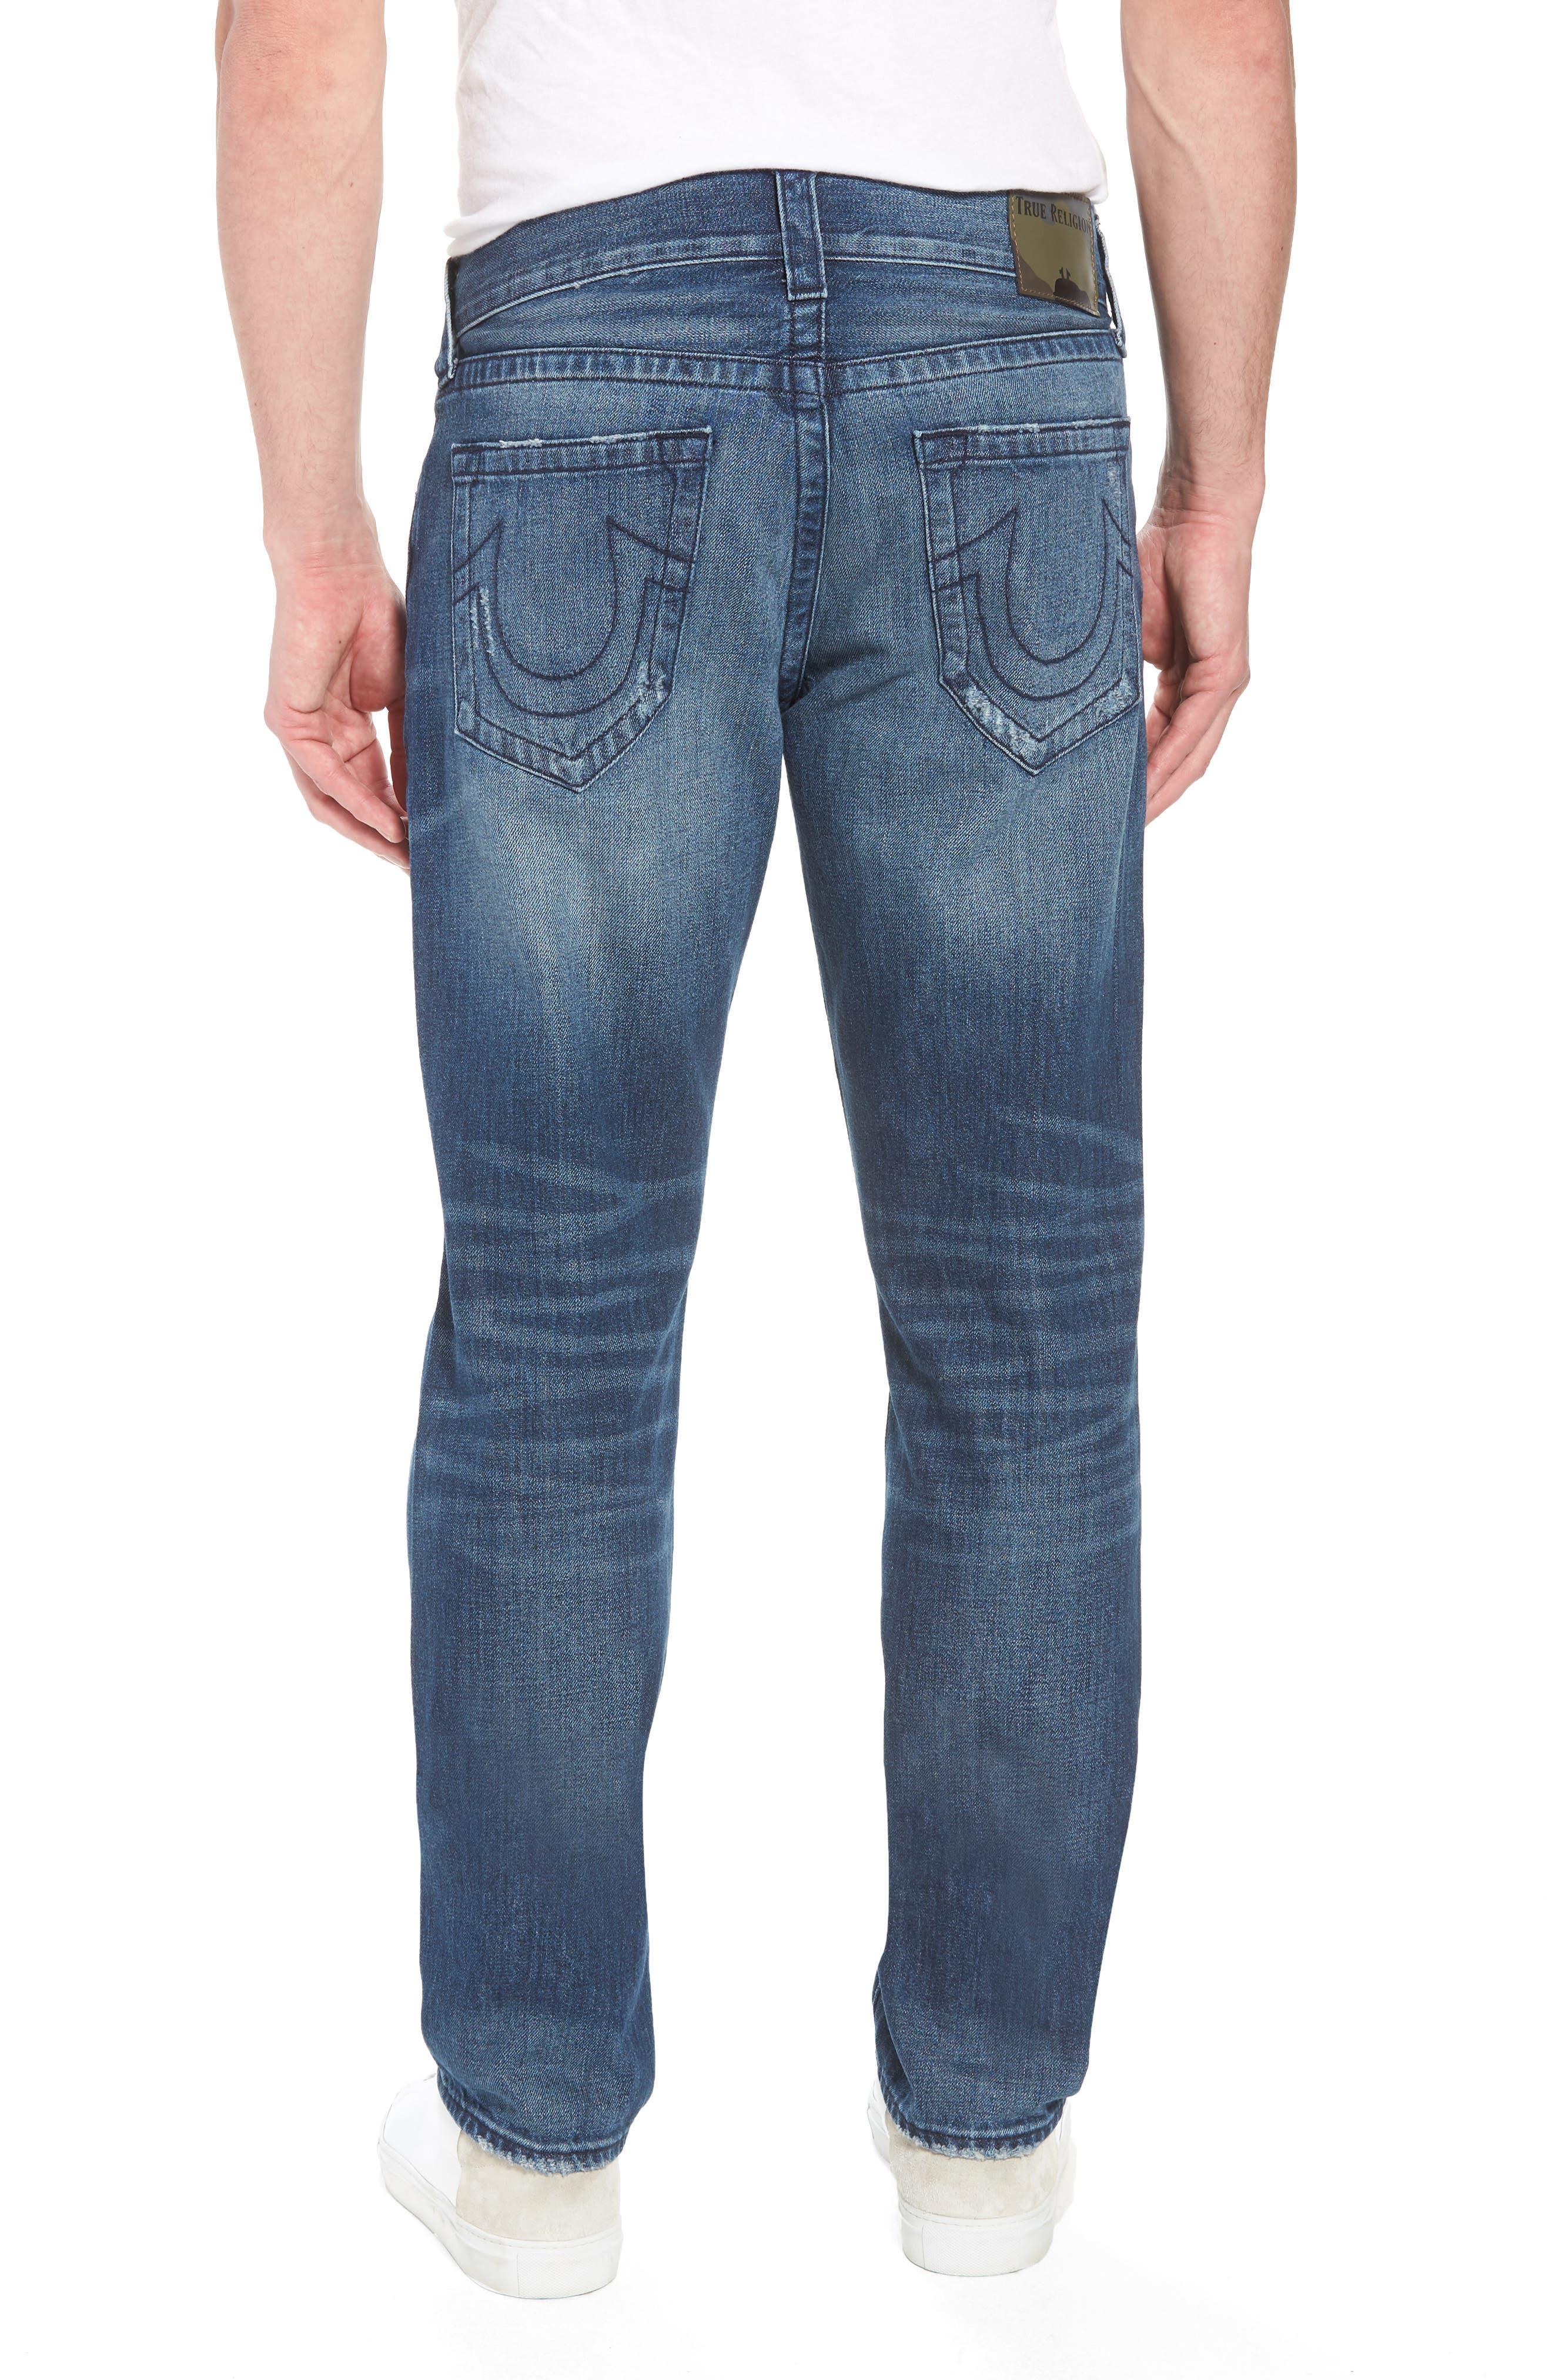 Geno Straight Leg Jeans,                             Alternate thumbnail 2, color,                             Worn Suspect